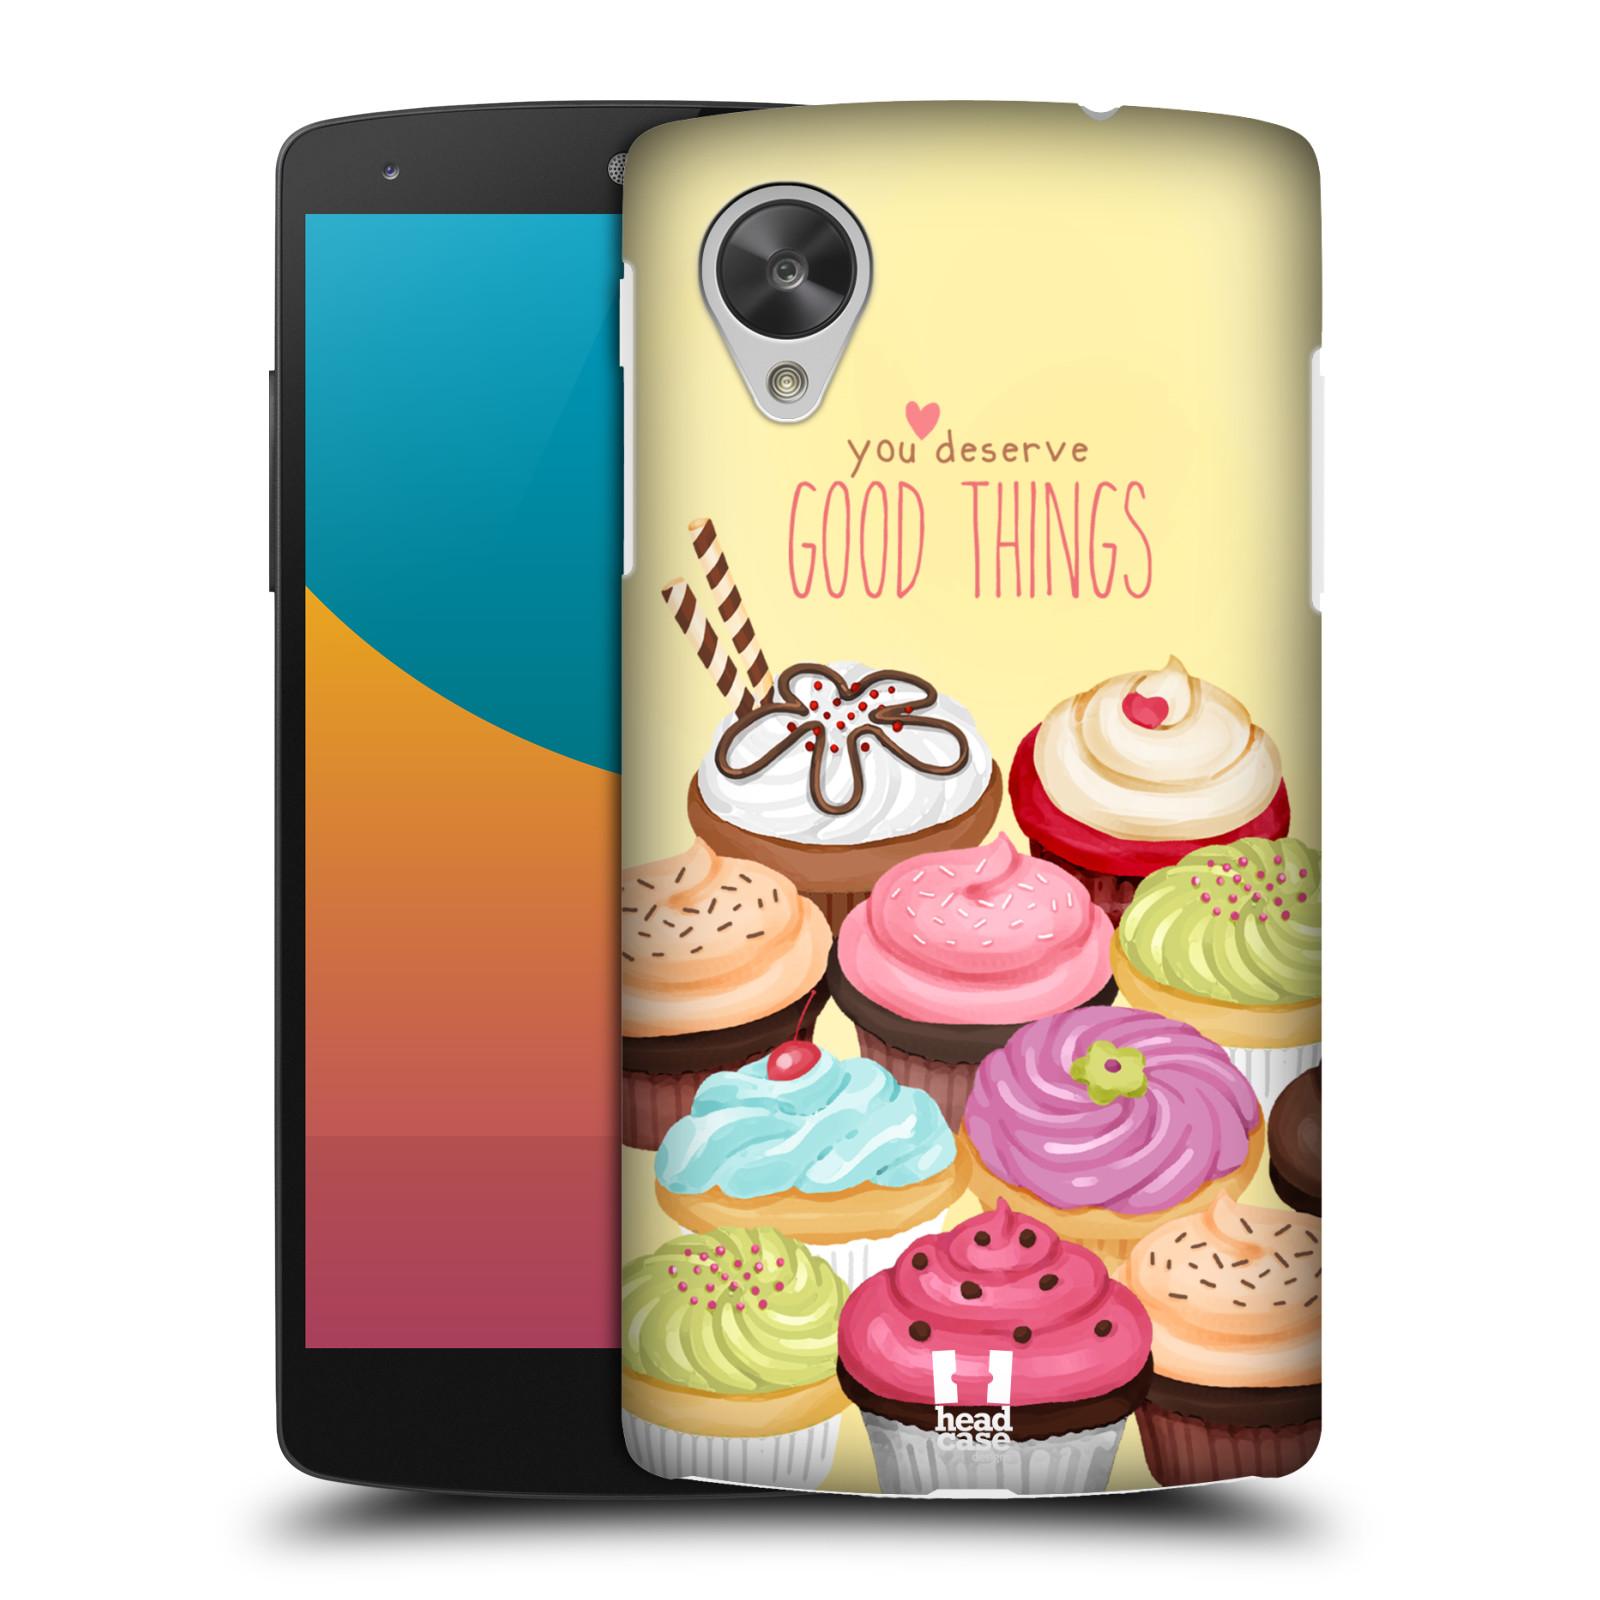 Plastové pouzdro na mobil LG Nexus 5 HEAD CASE CUPCAKE GOOD THINGS (Kryt či obal na mobilní telefon LG Google Nexus 5 D821)